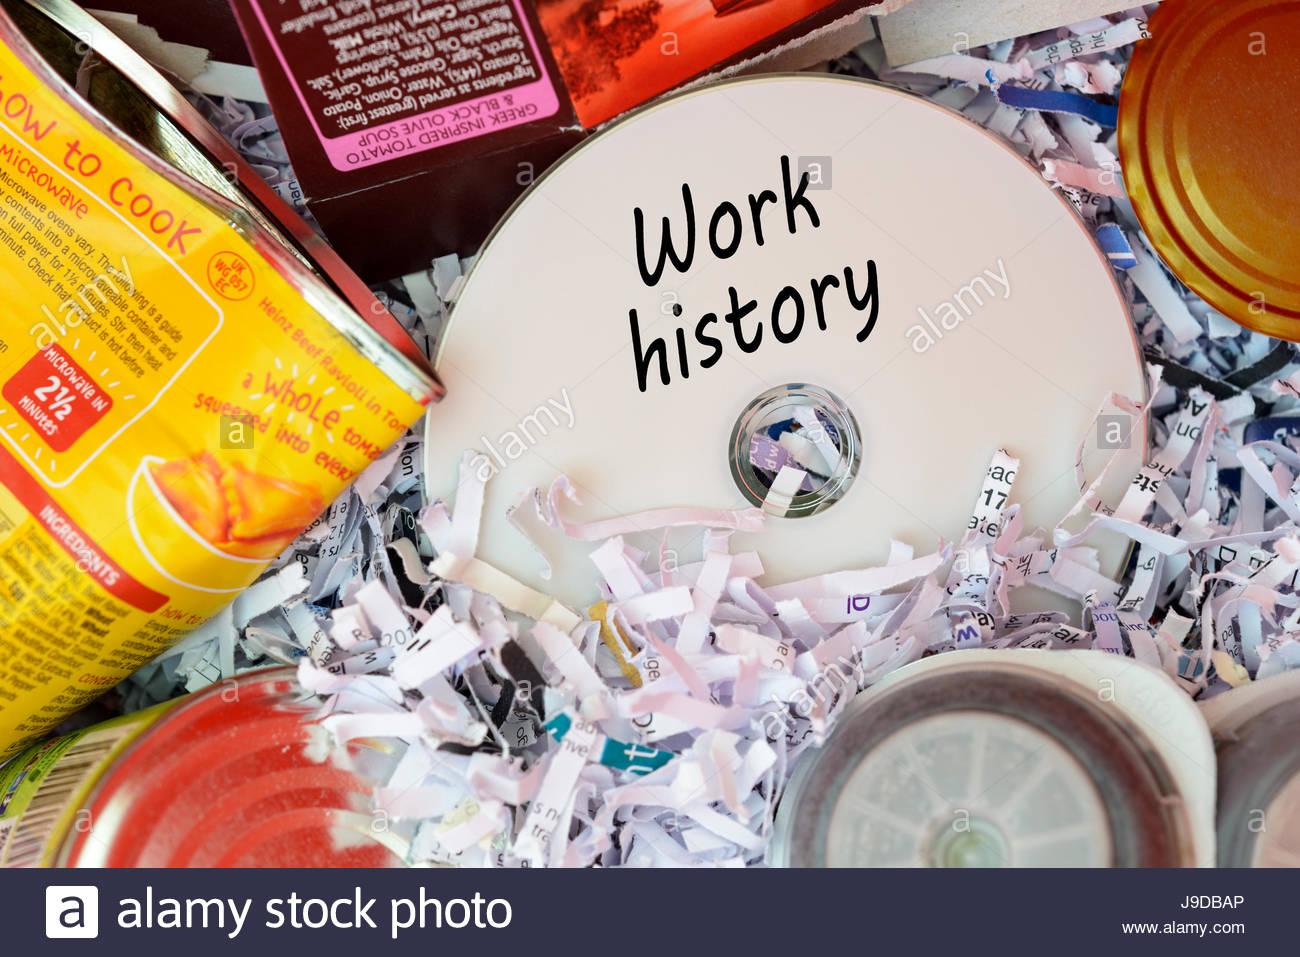 Work history, data disc thrown in Bin, Dorset, England. Stock Photo